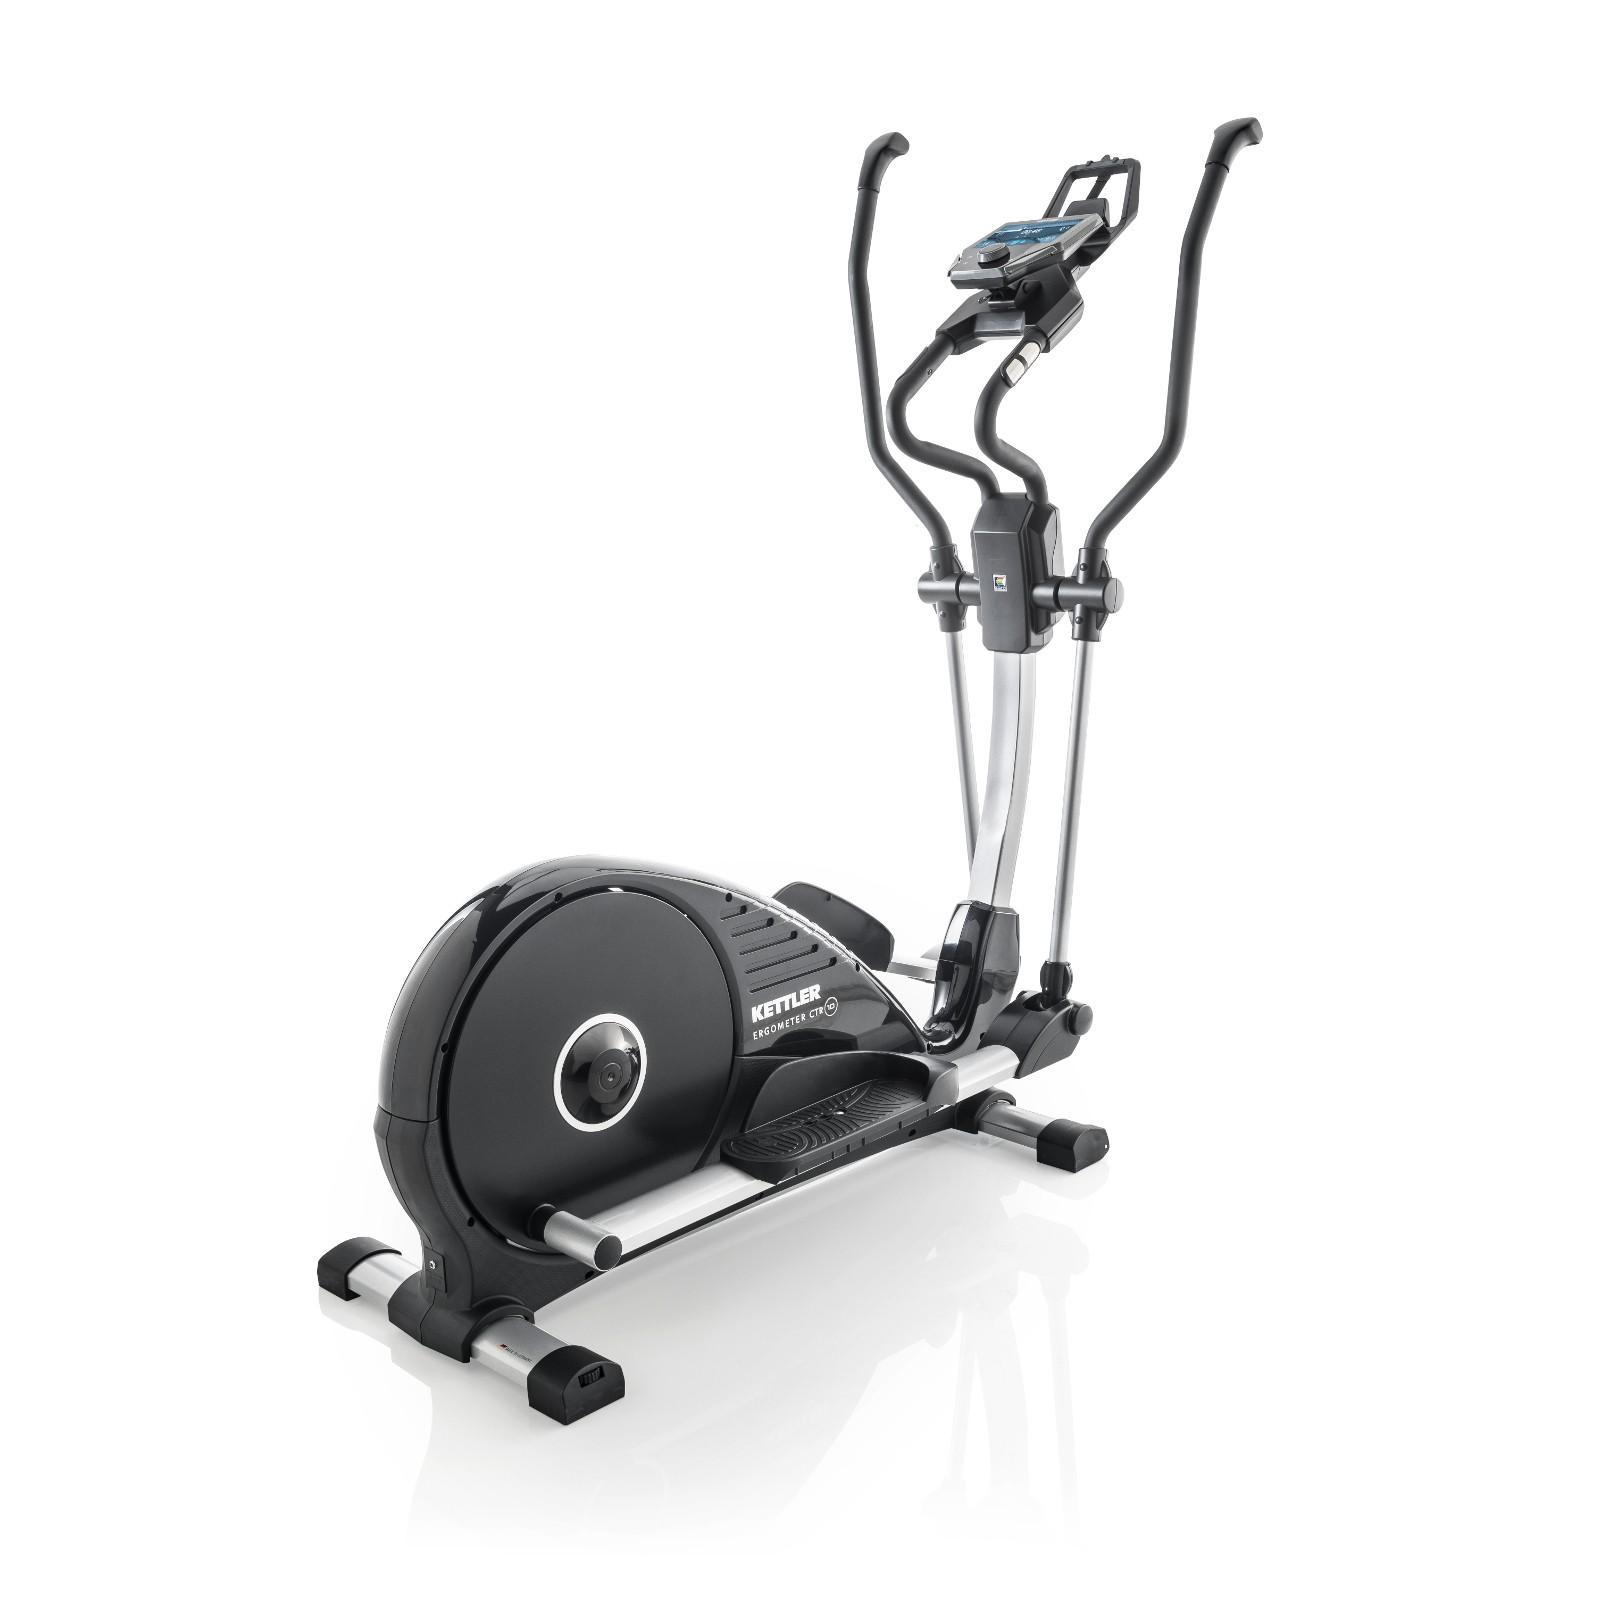 kettler elliptical cross trainer ctr 10 sport tiedje. Black Bedroom Furniture Sets. Home Design Ideas